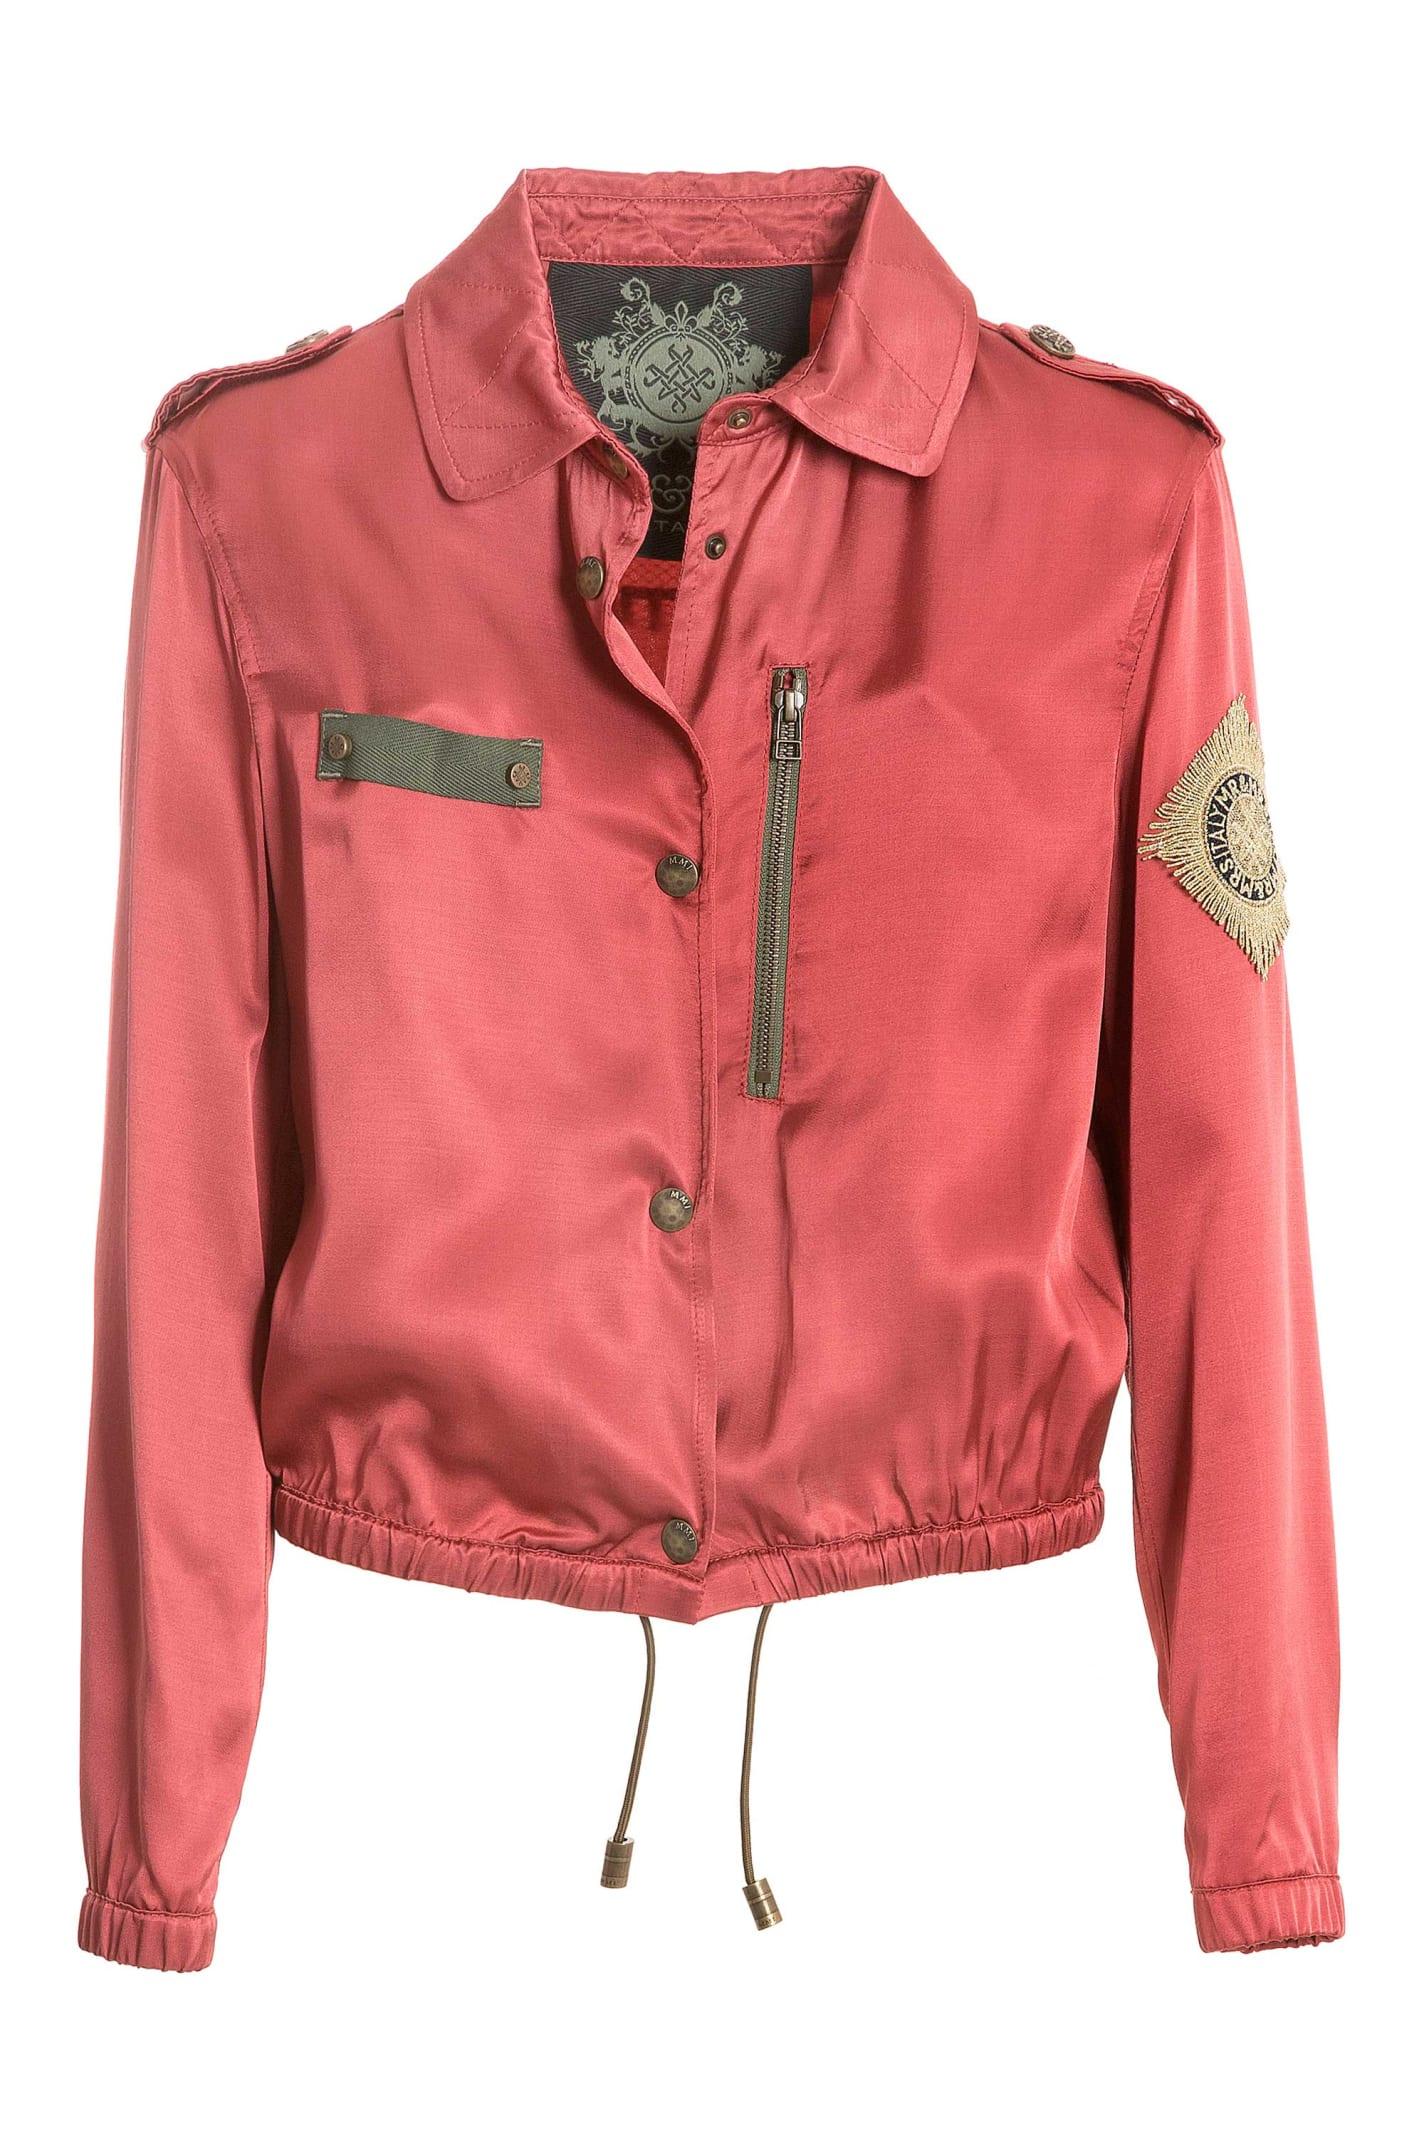 Embroidery Fluide Satin Viscose Mini Field Jacket